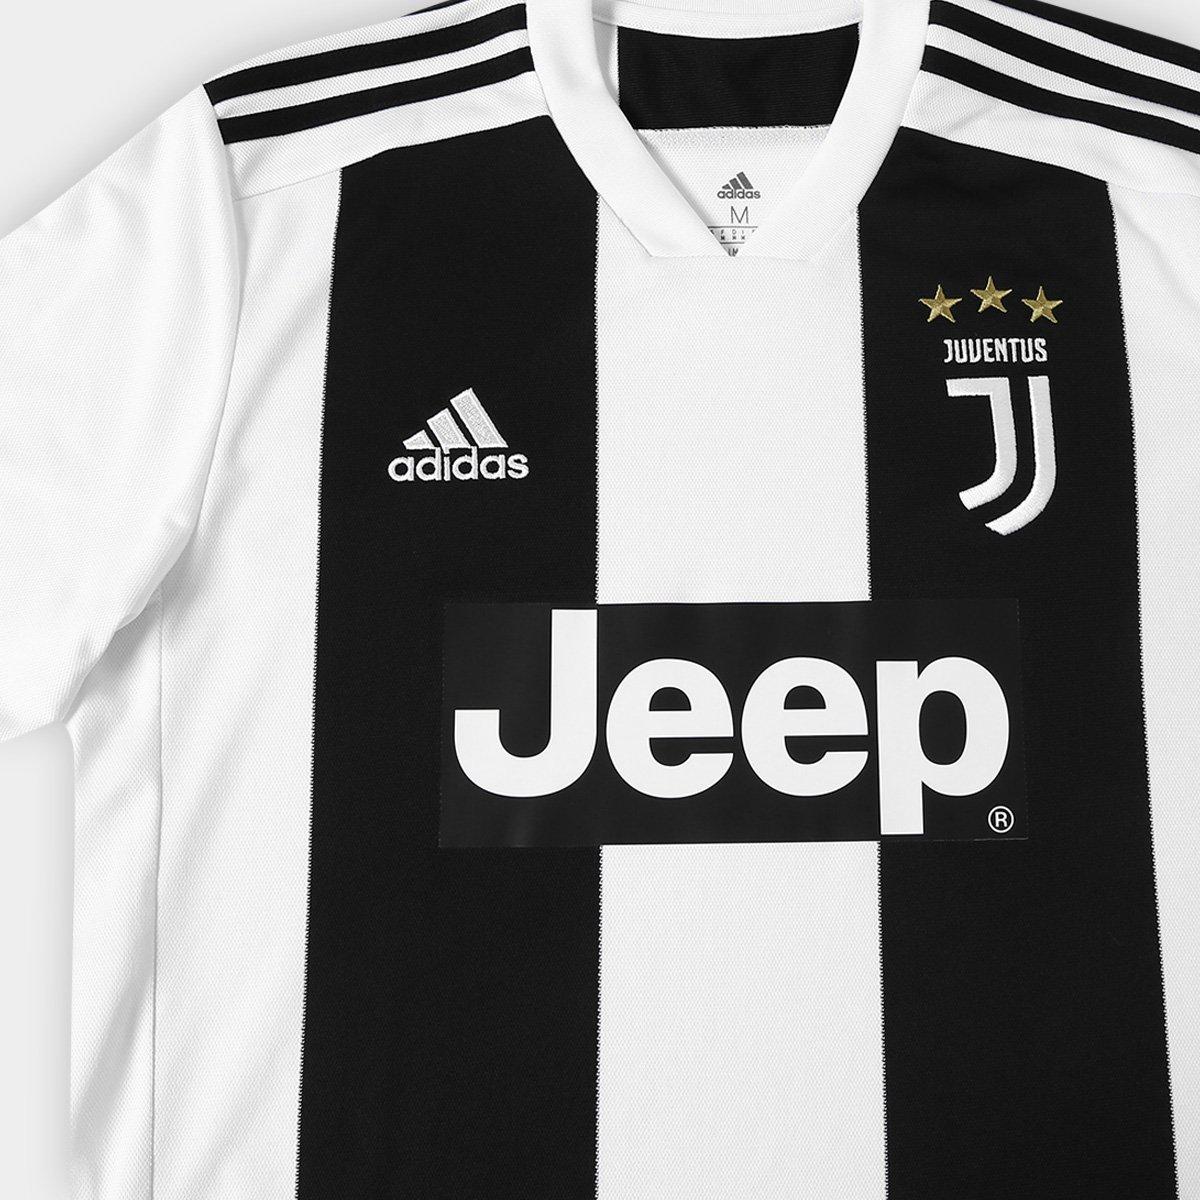 Camisa Juventus Home 2018 s n° - Torcedor Adidas Masculina - Compre ... 1bb7d1e45fafd